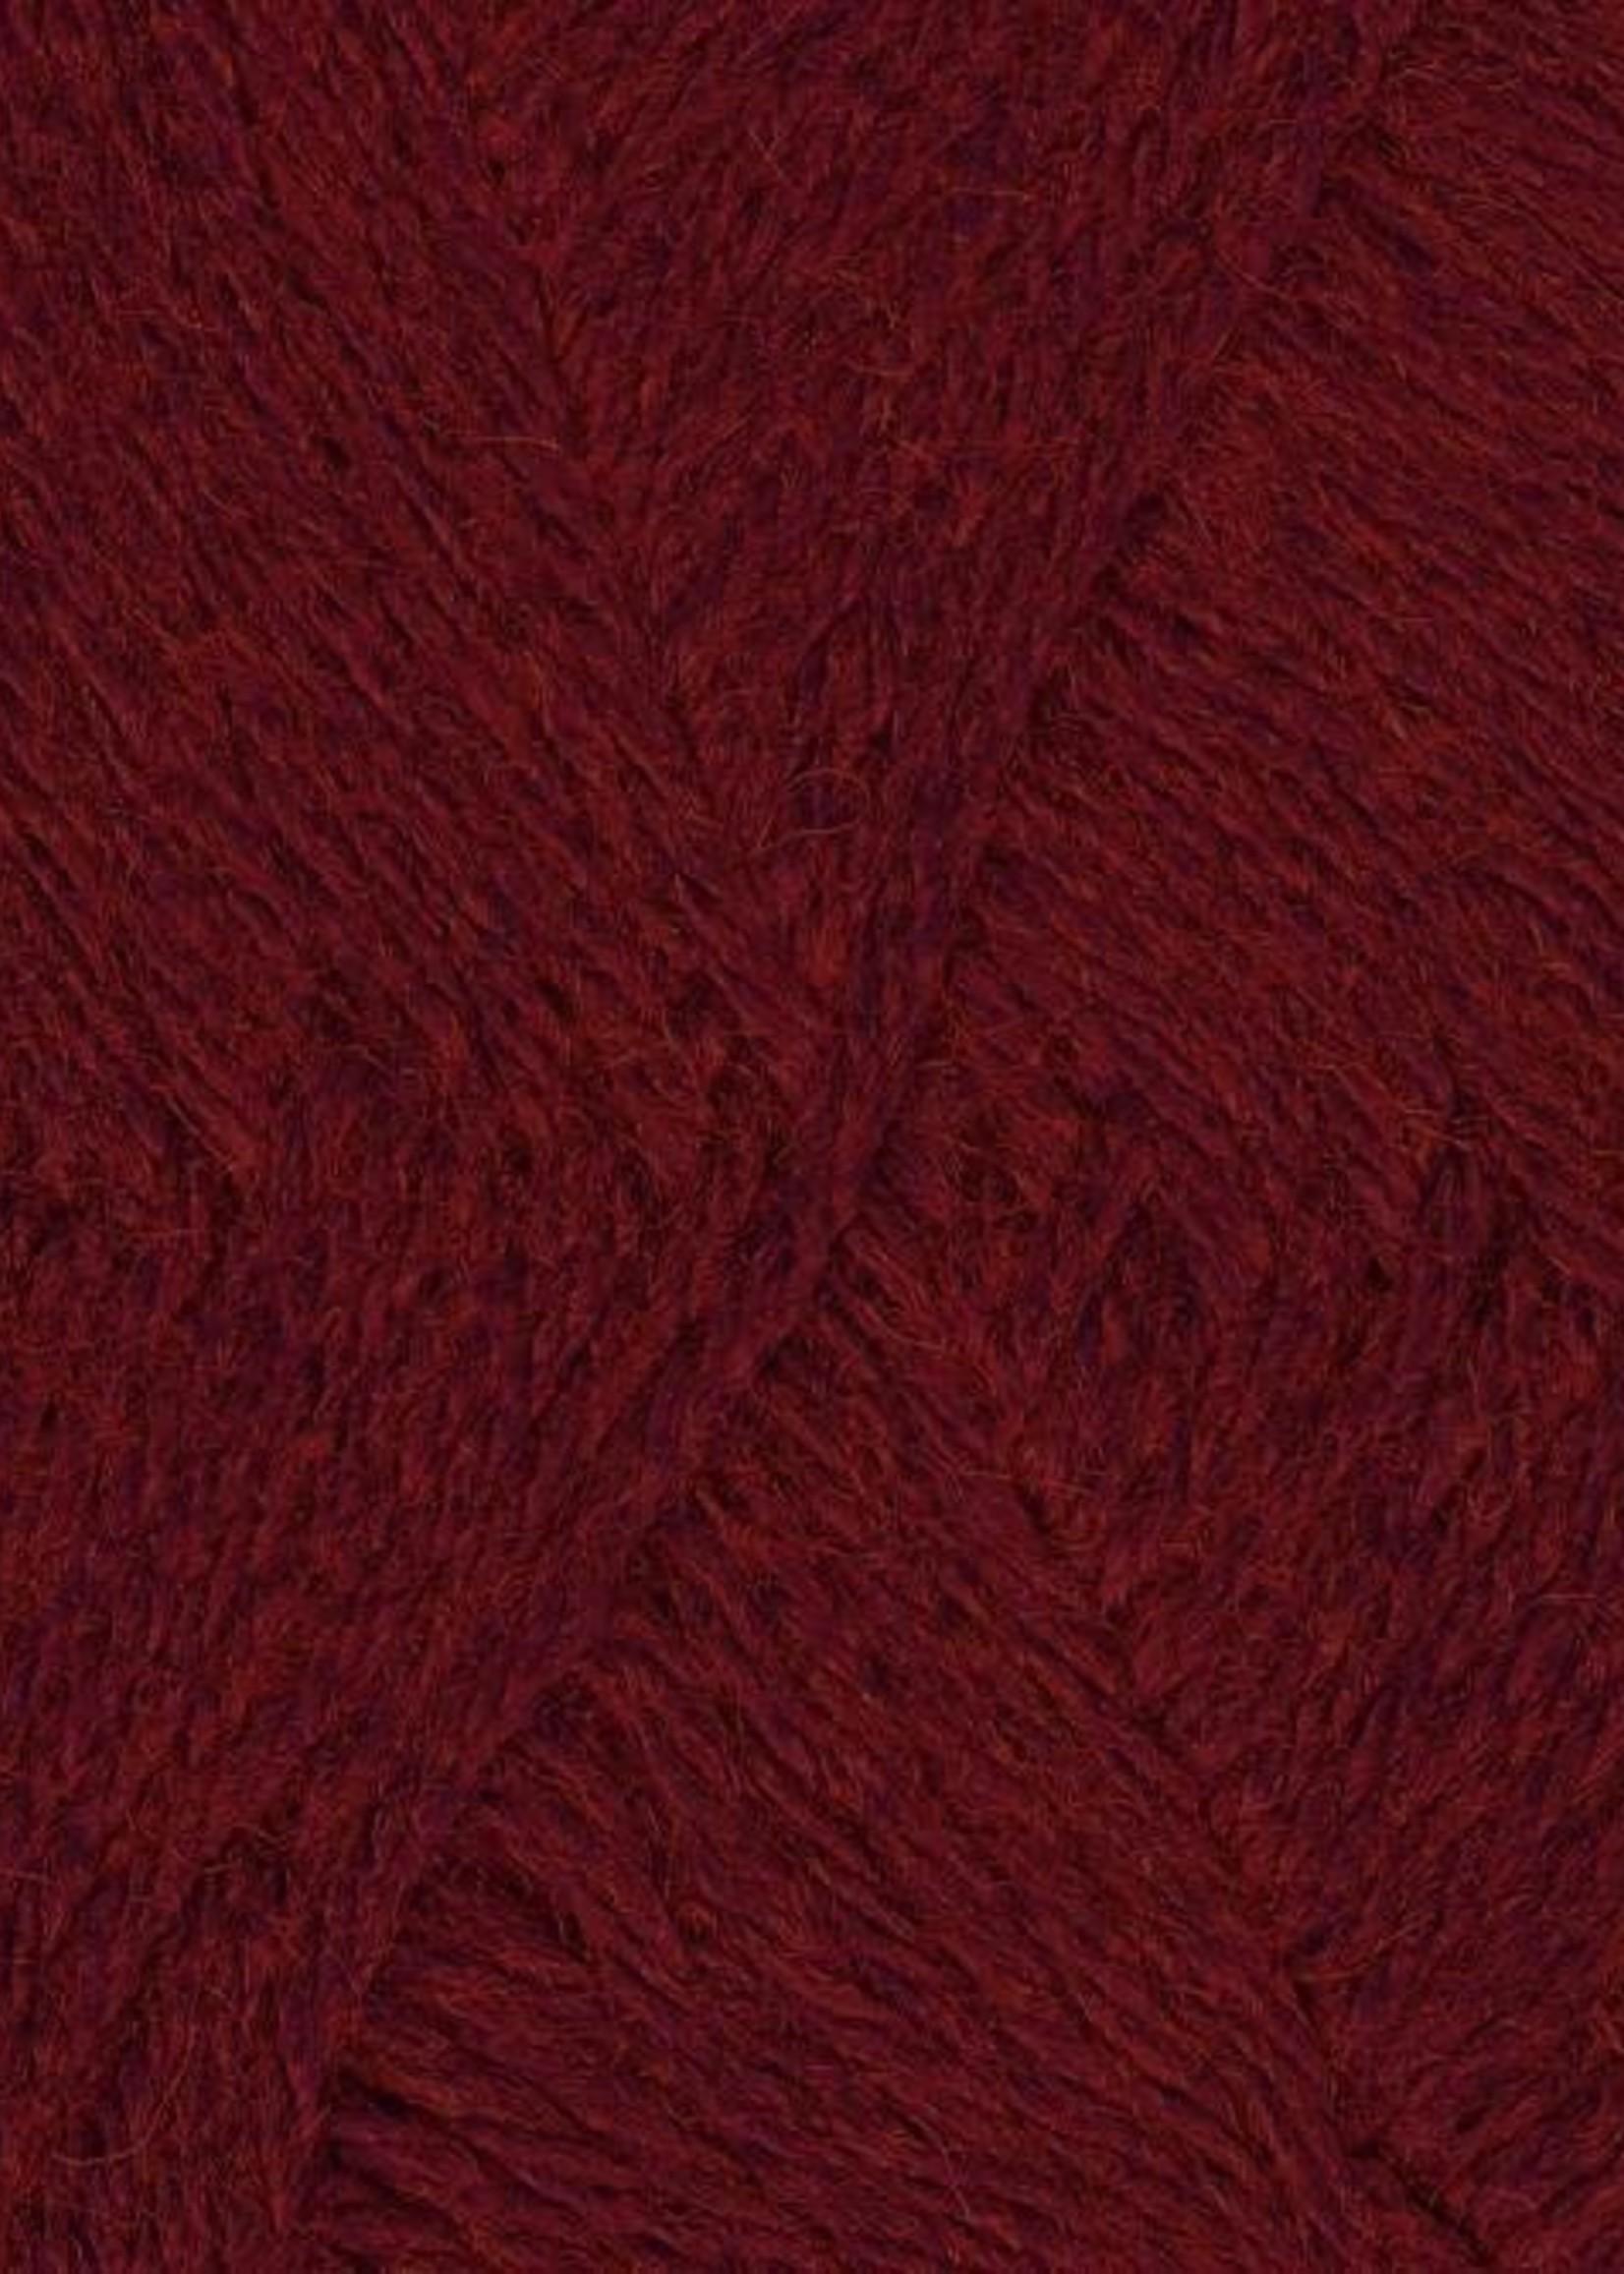 Knitting Fever KFI Collection Teenie Weenie Wool - Burgundy